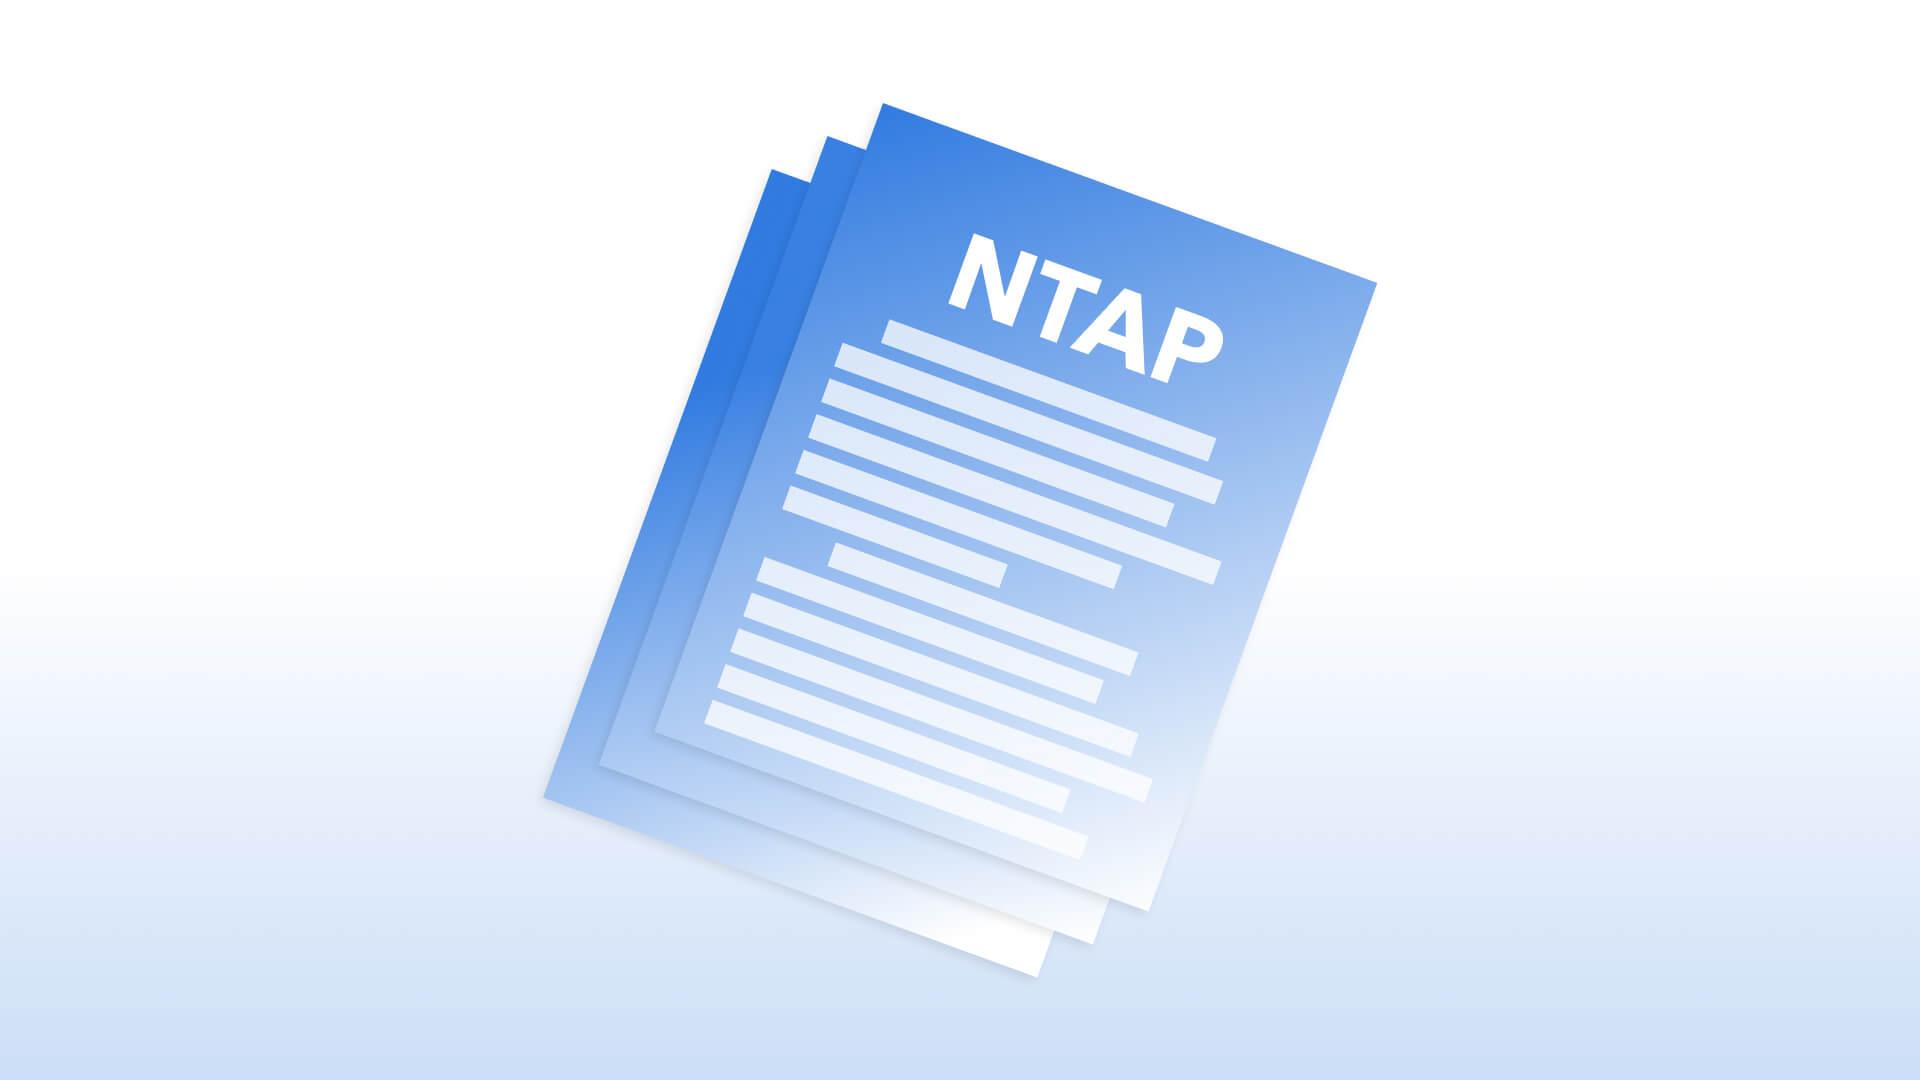 Download the Viz.ai NTAP Packet